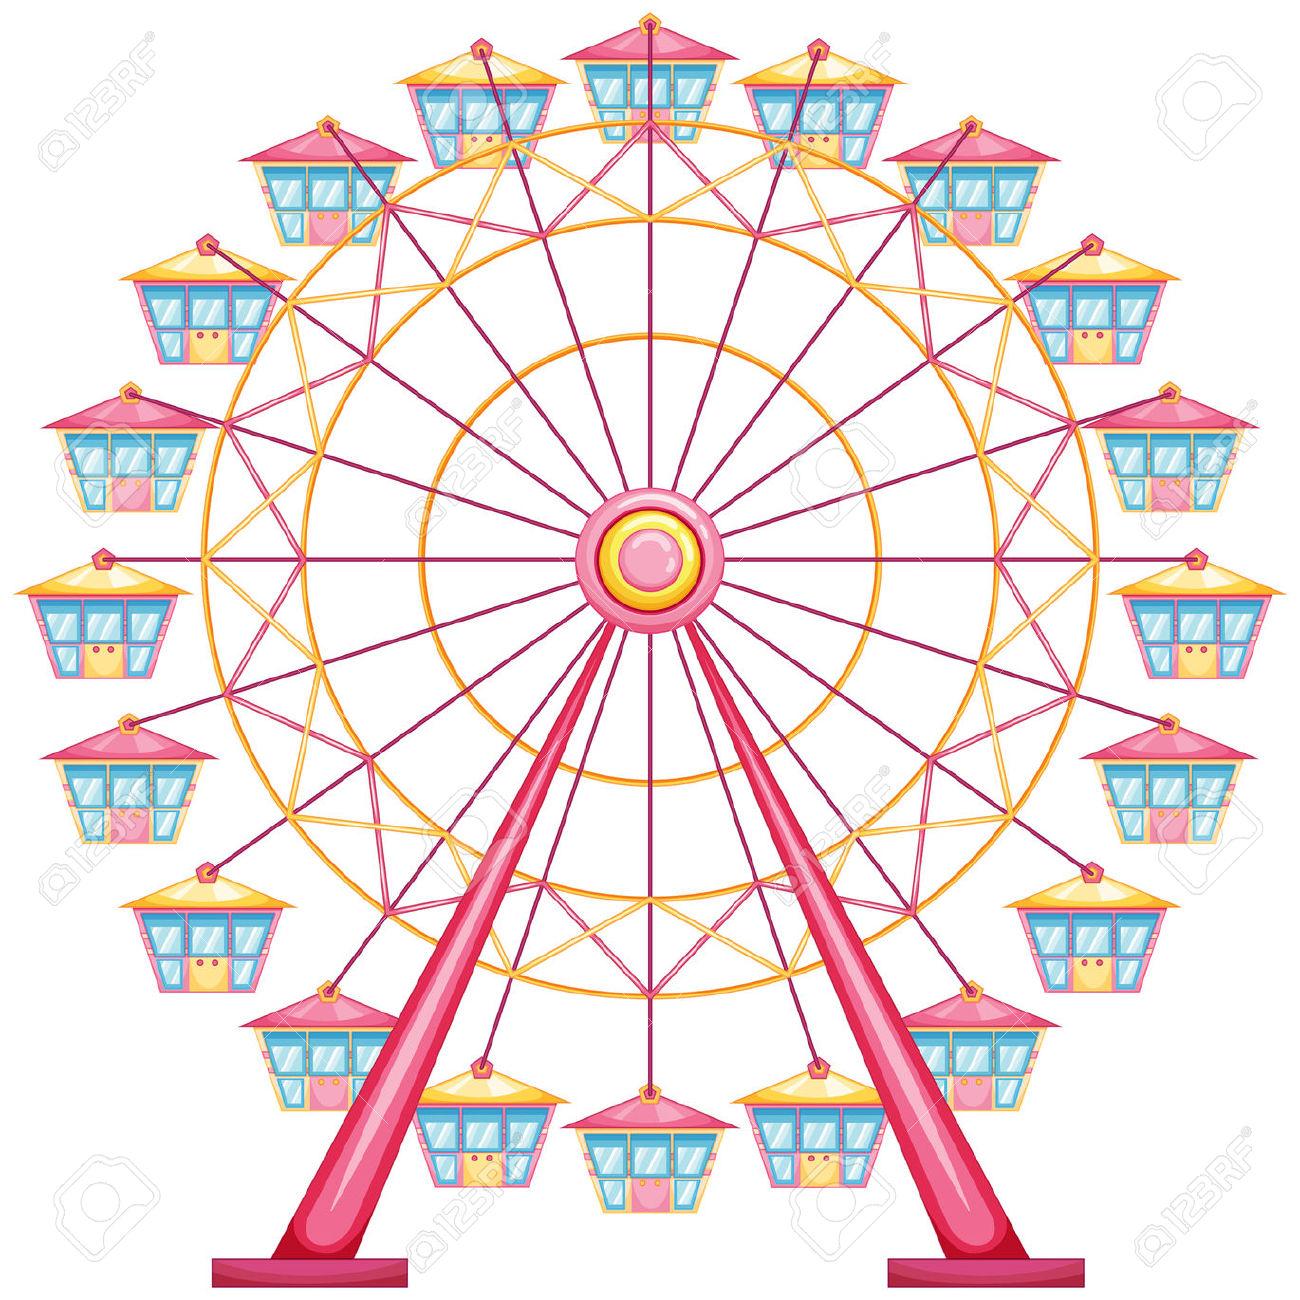 Ferris wheel clipart 2 - Ferris Wheel Clipart